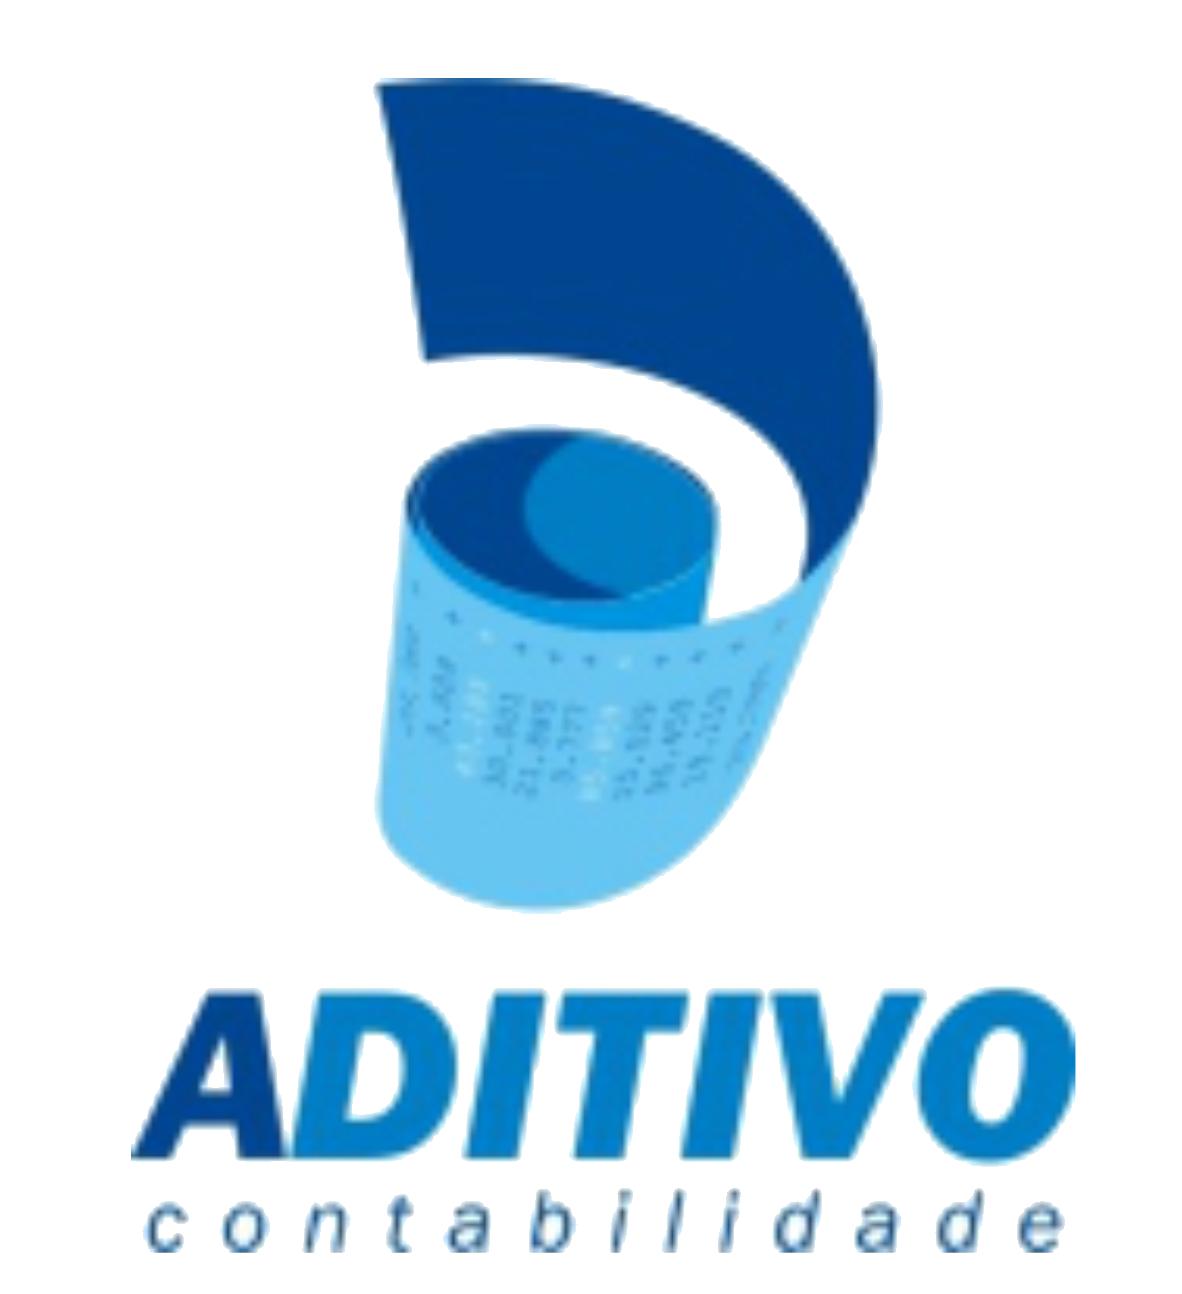 Logotipo Aditivo Contabilidade